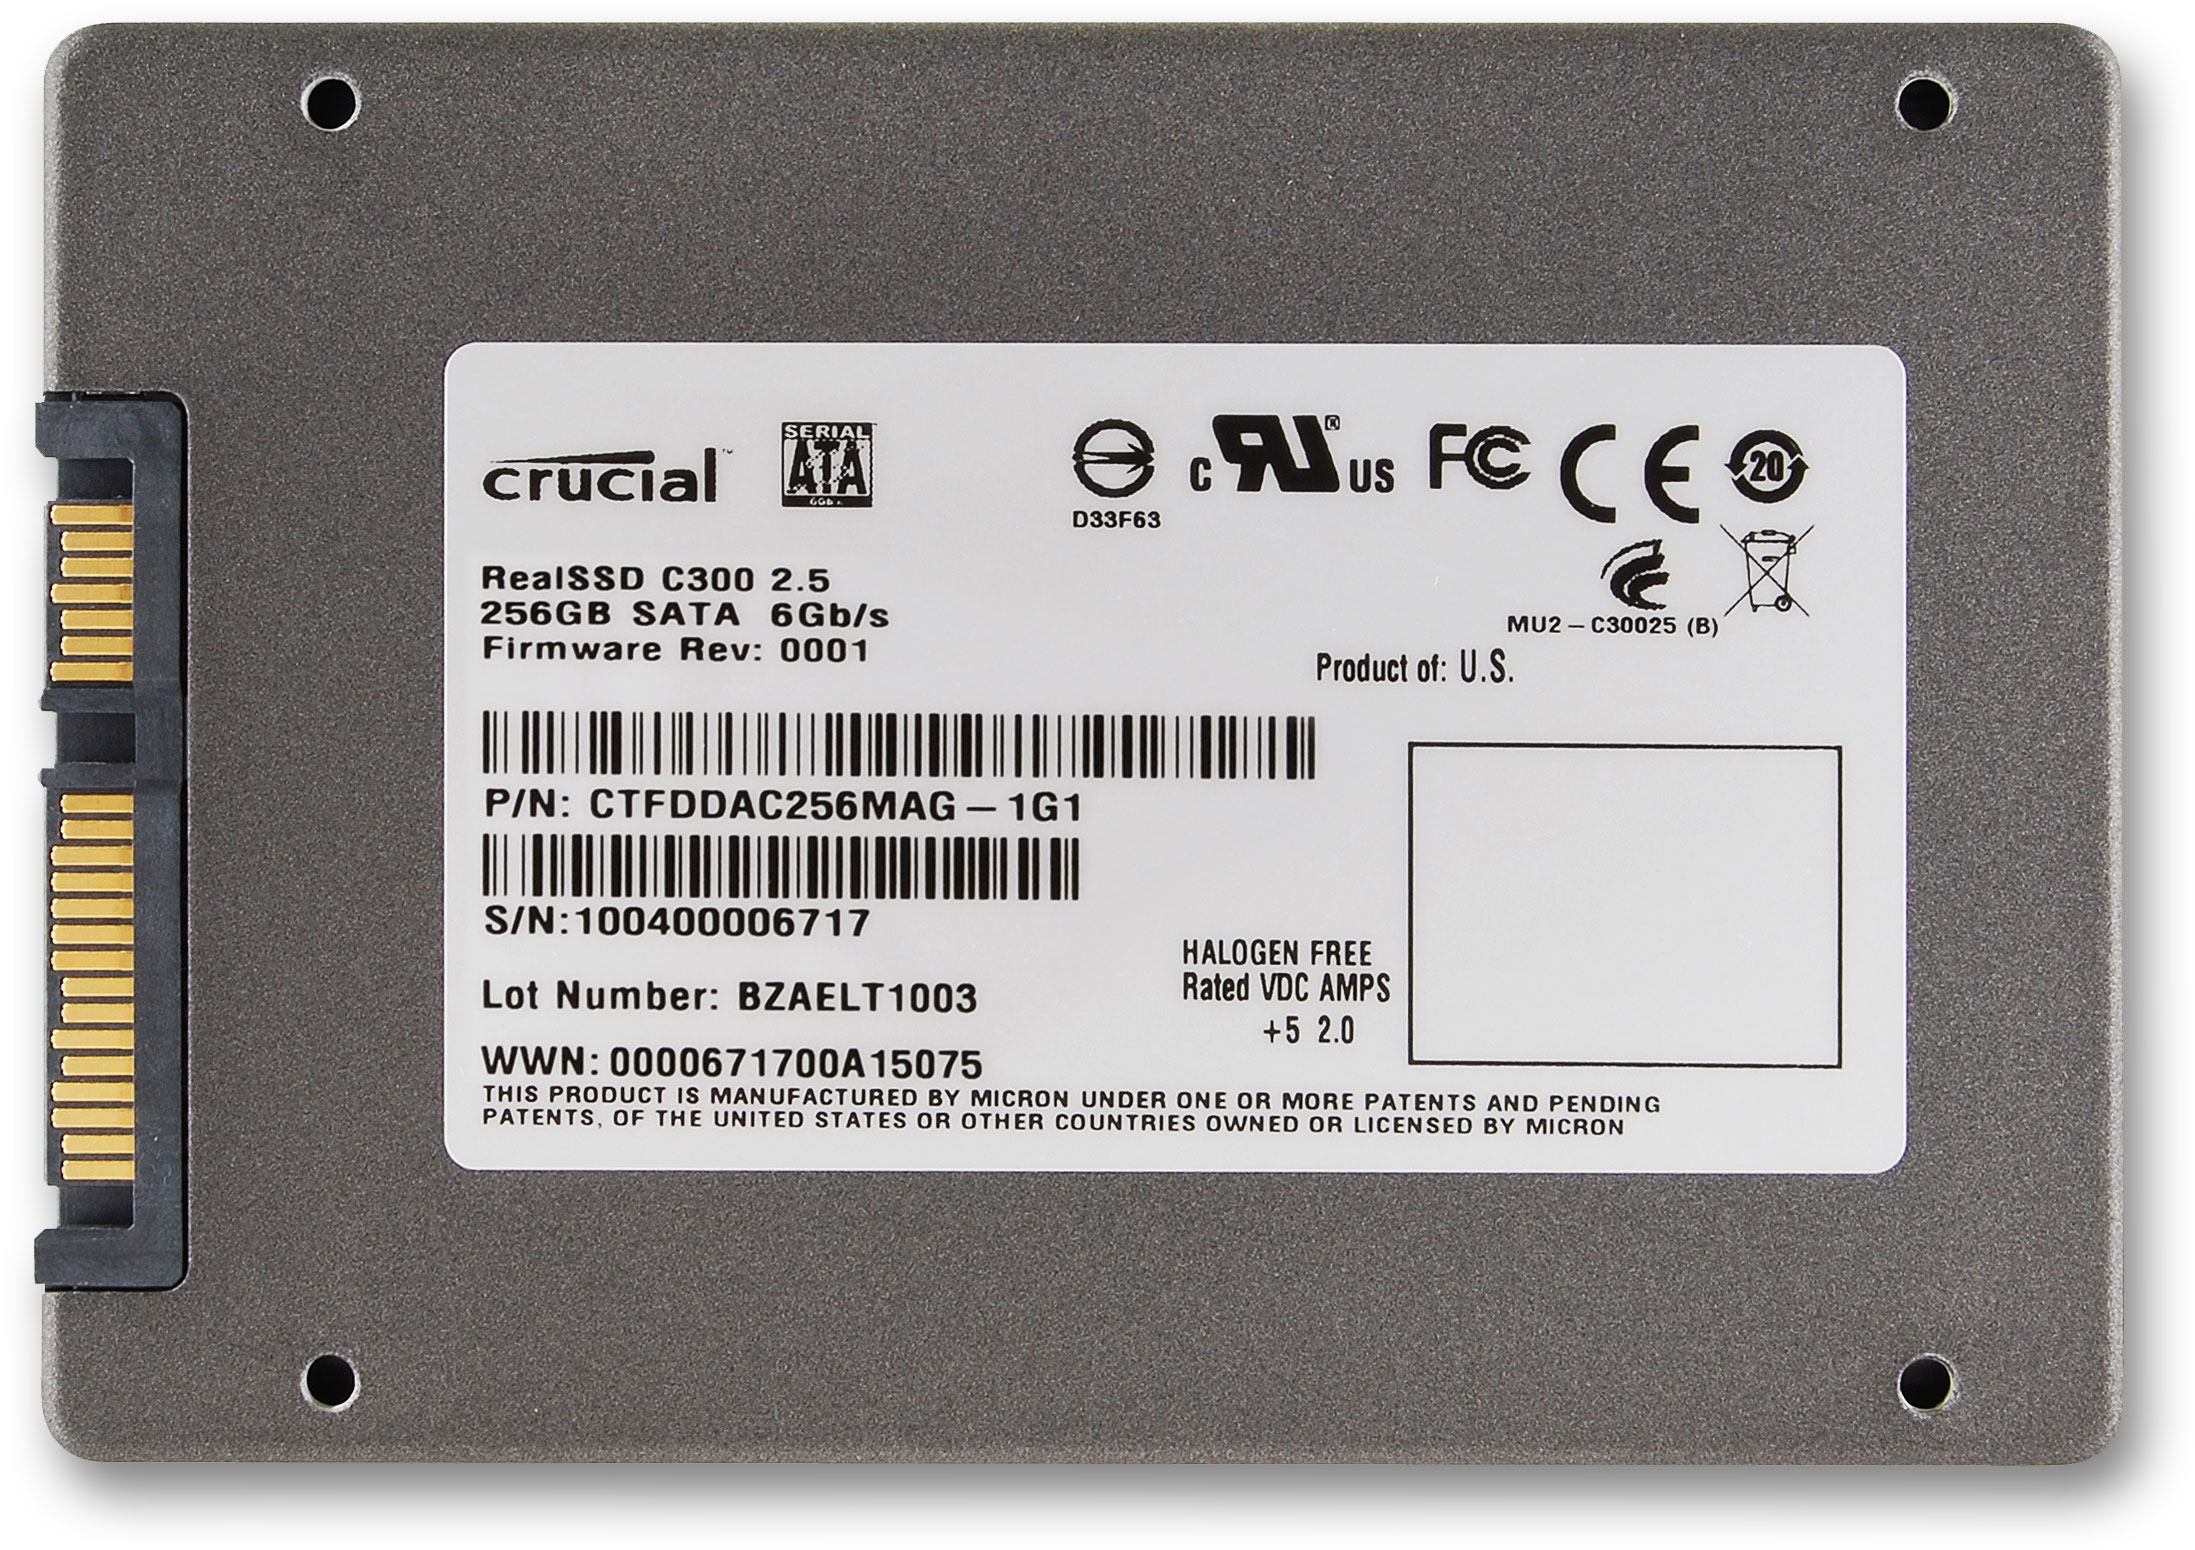 Crucial Realssd C300 2 5 Inch Sata 6gb S